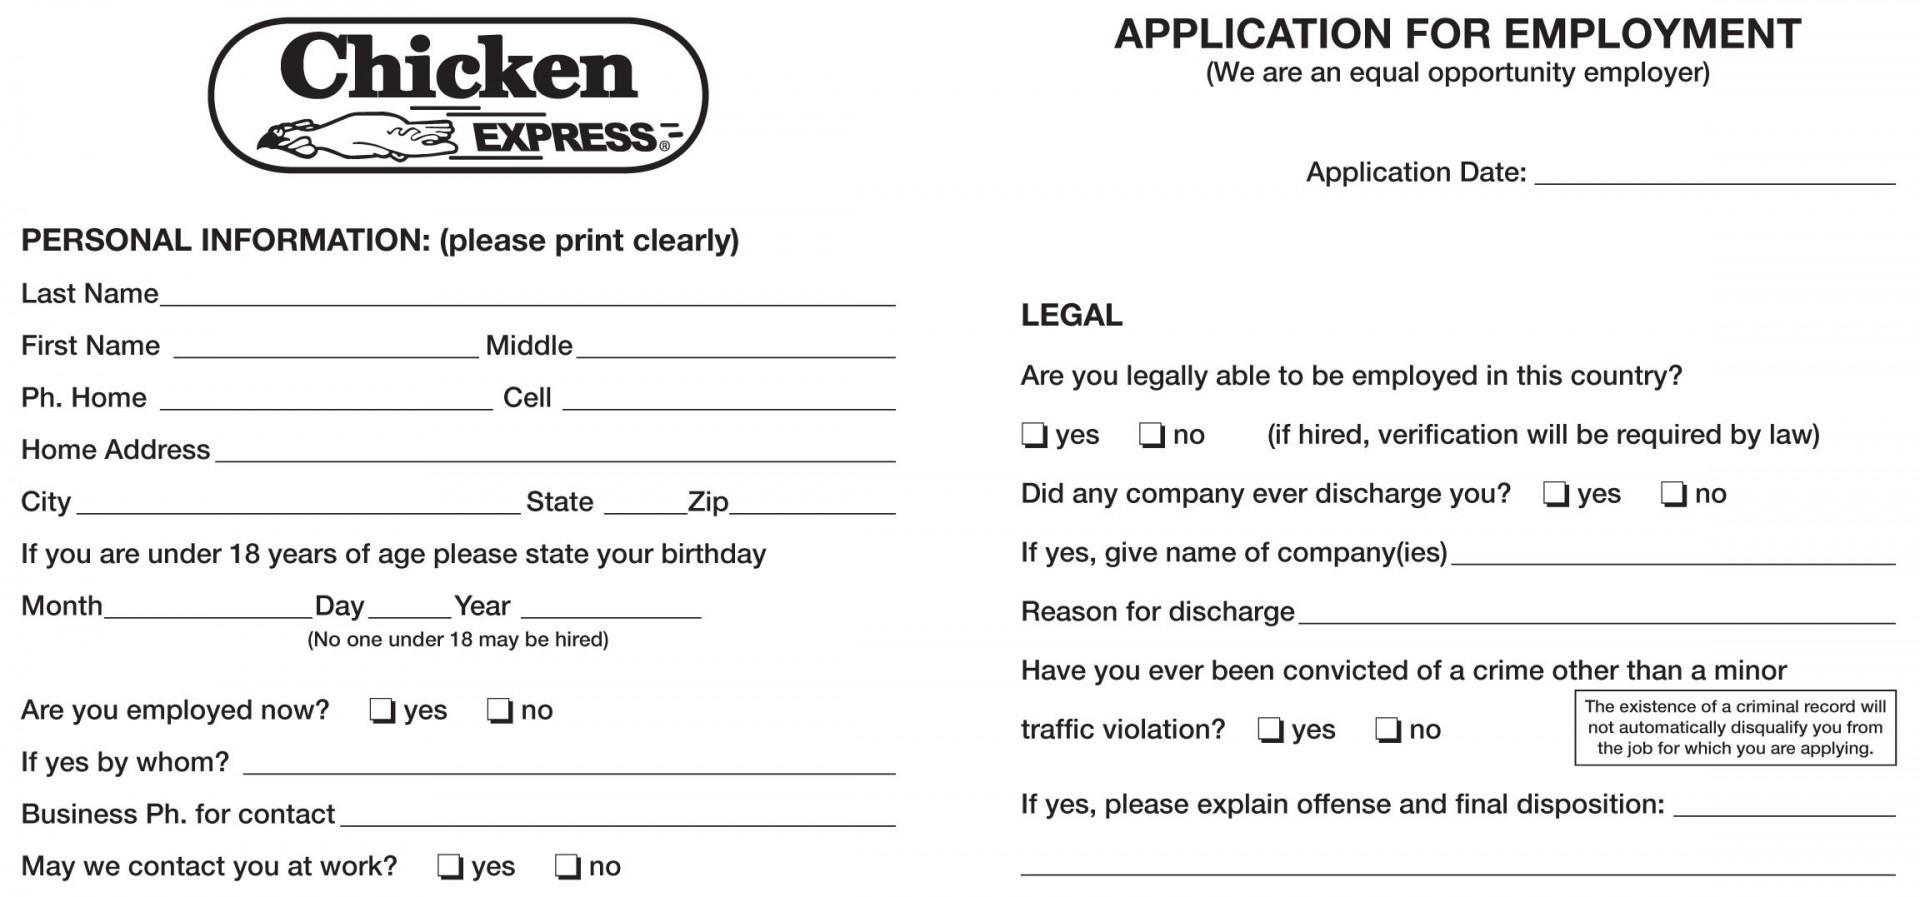 California Employment Application 2018 Template